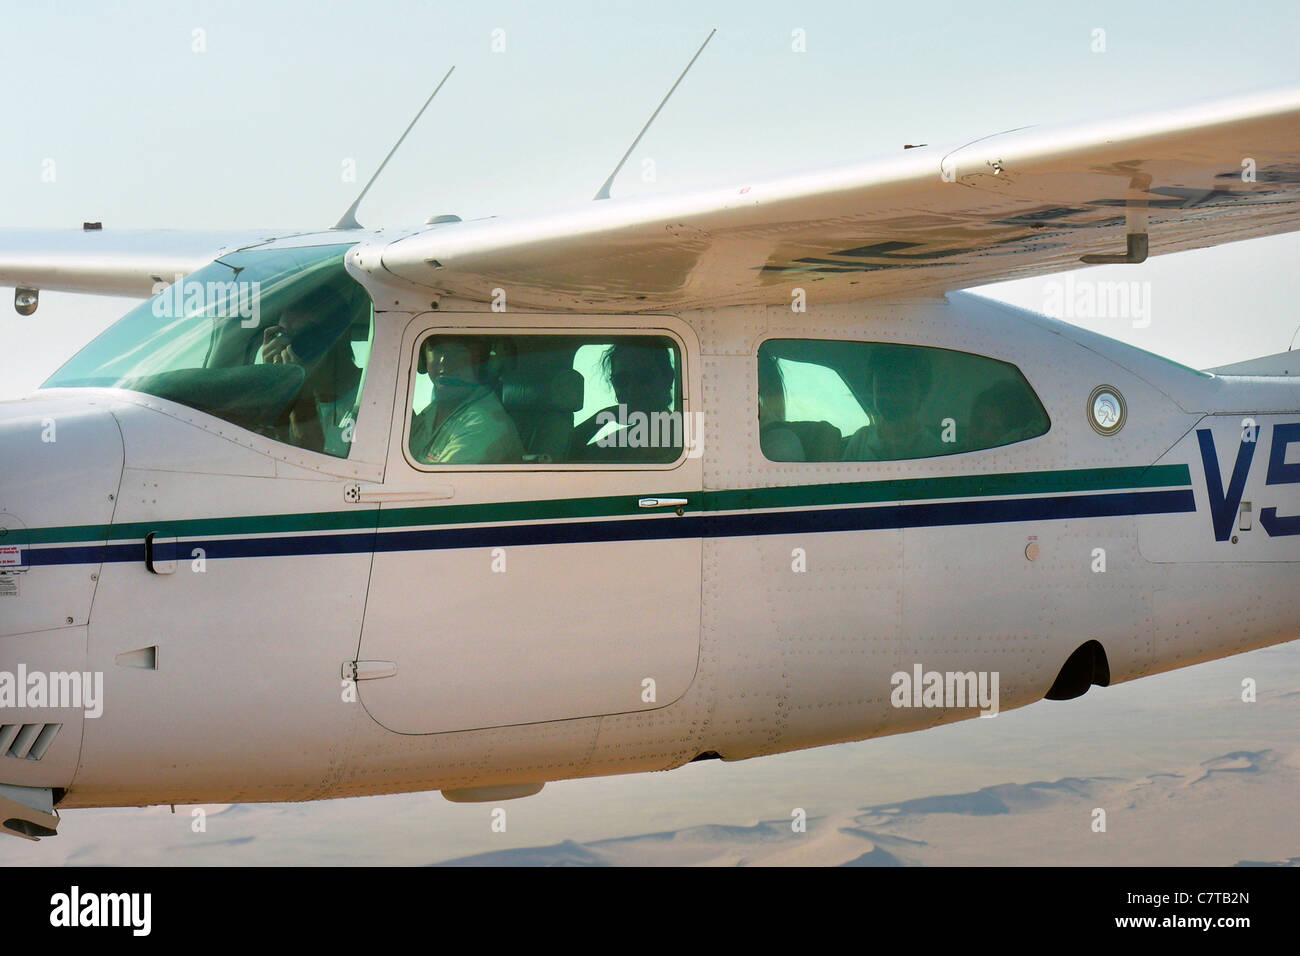 Cessna 210 airplane - Stock Image